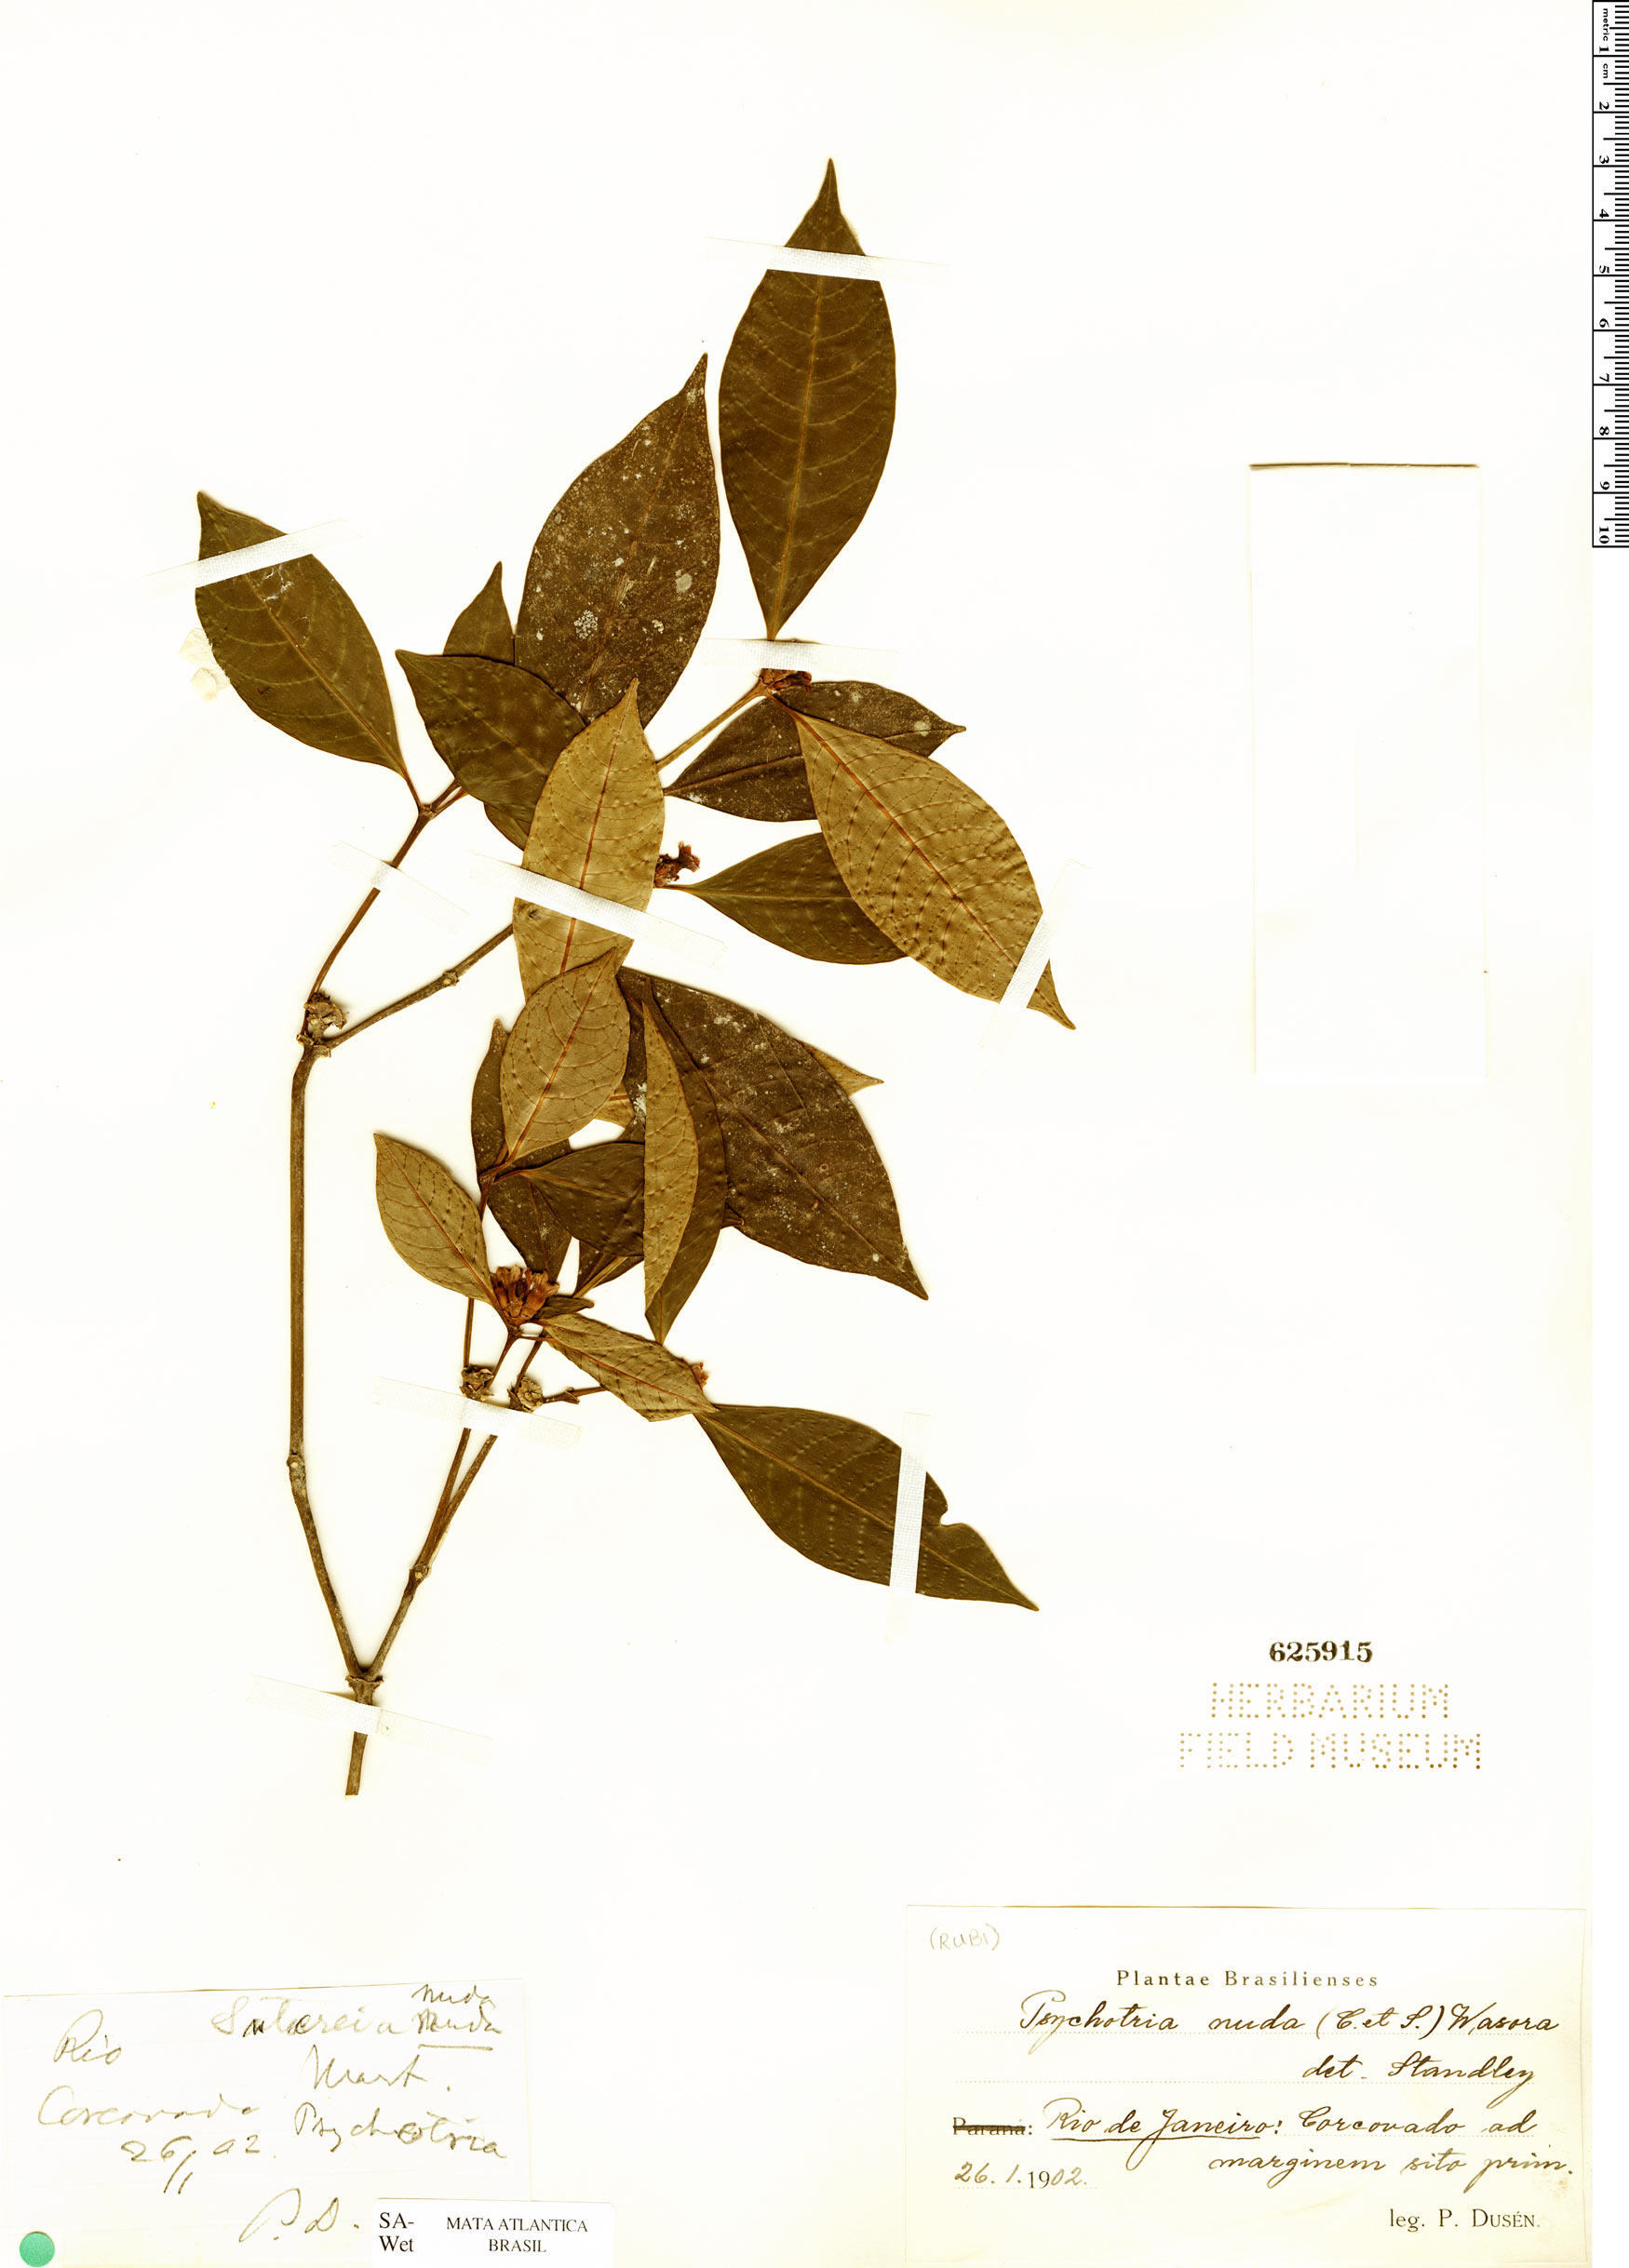 Espécimen: Psychotria nuda